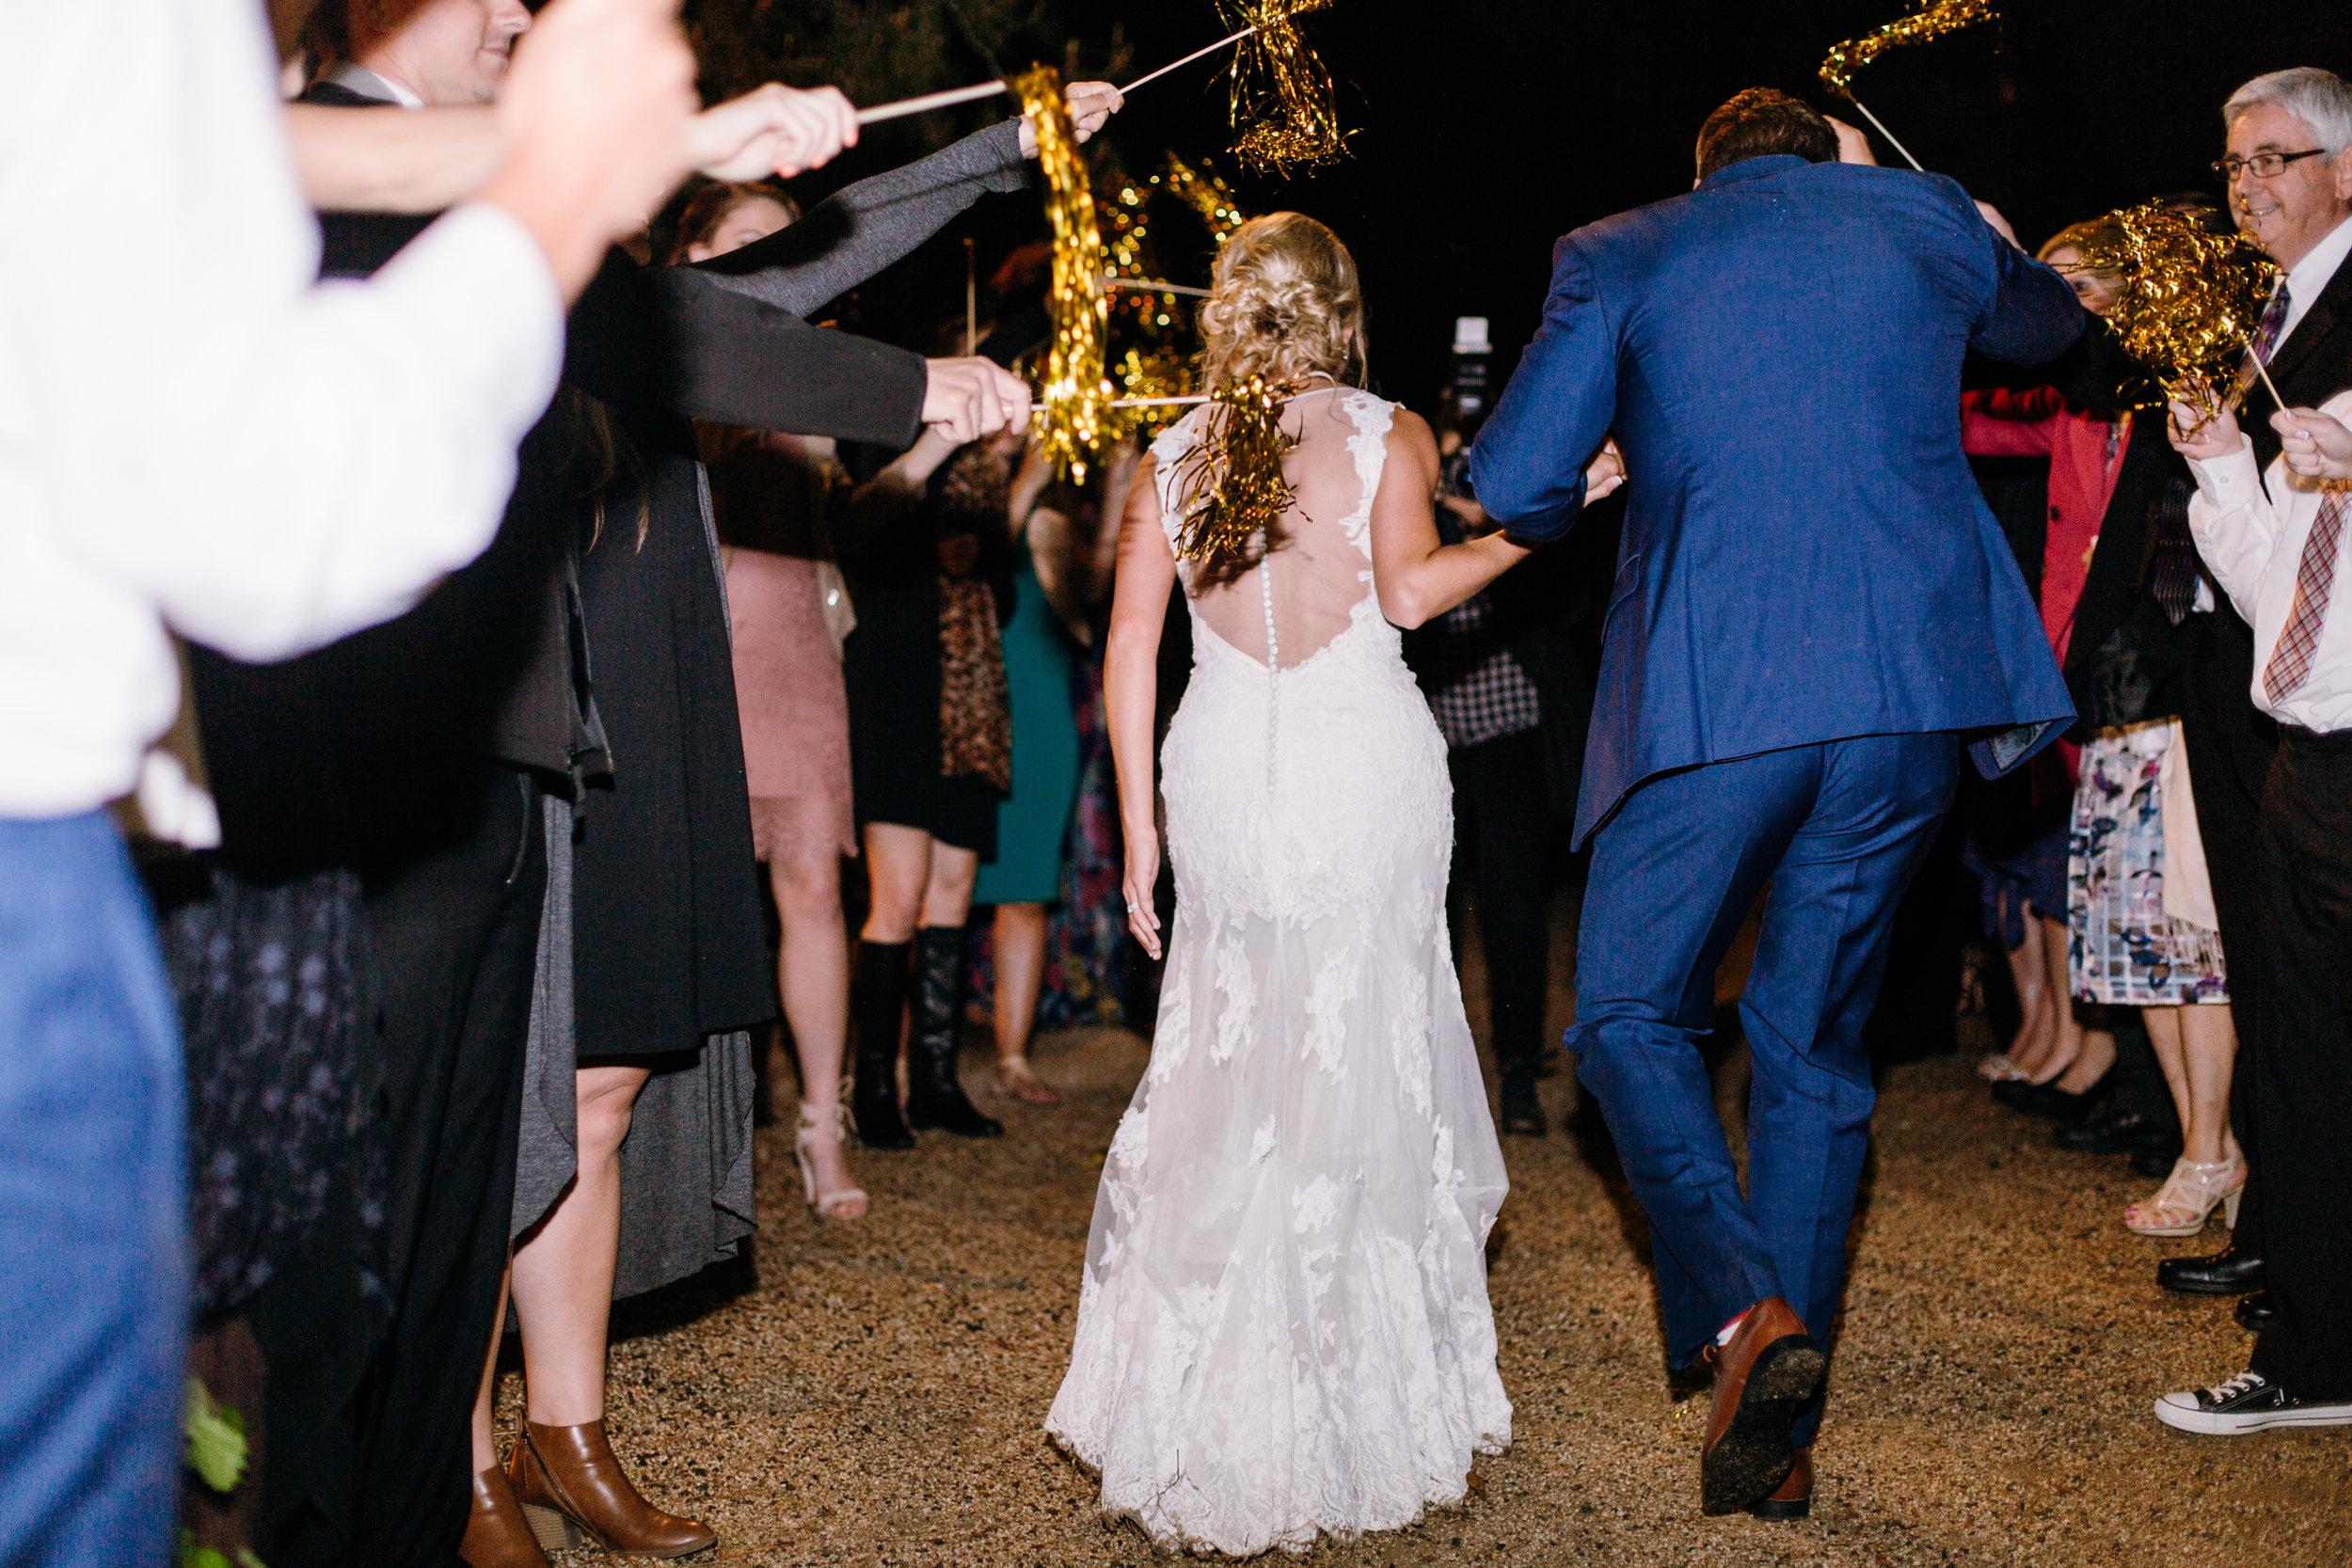 KaraNixonWeddings-LakeOakMeadows-Temecula-Wedding-58.jpg